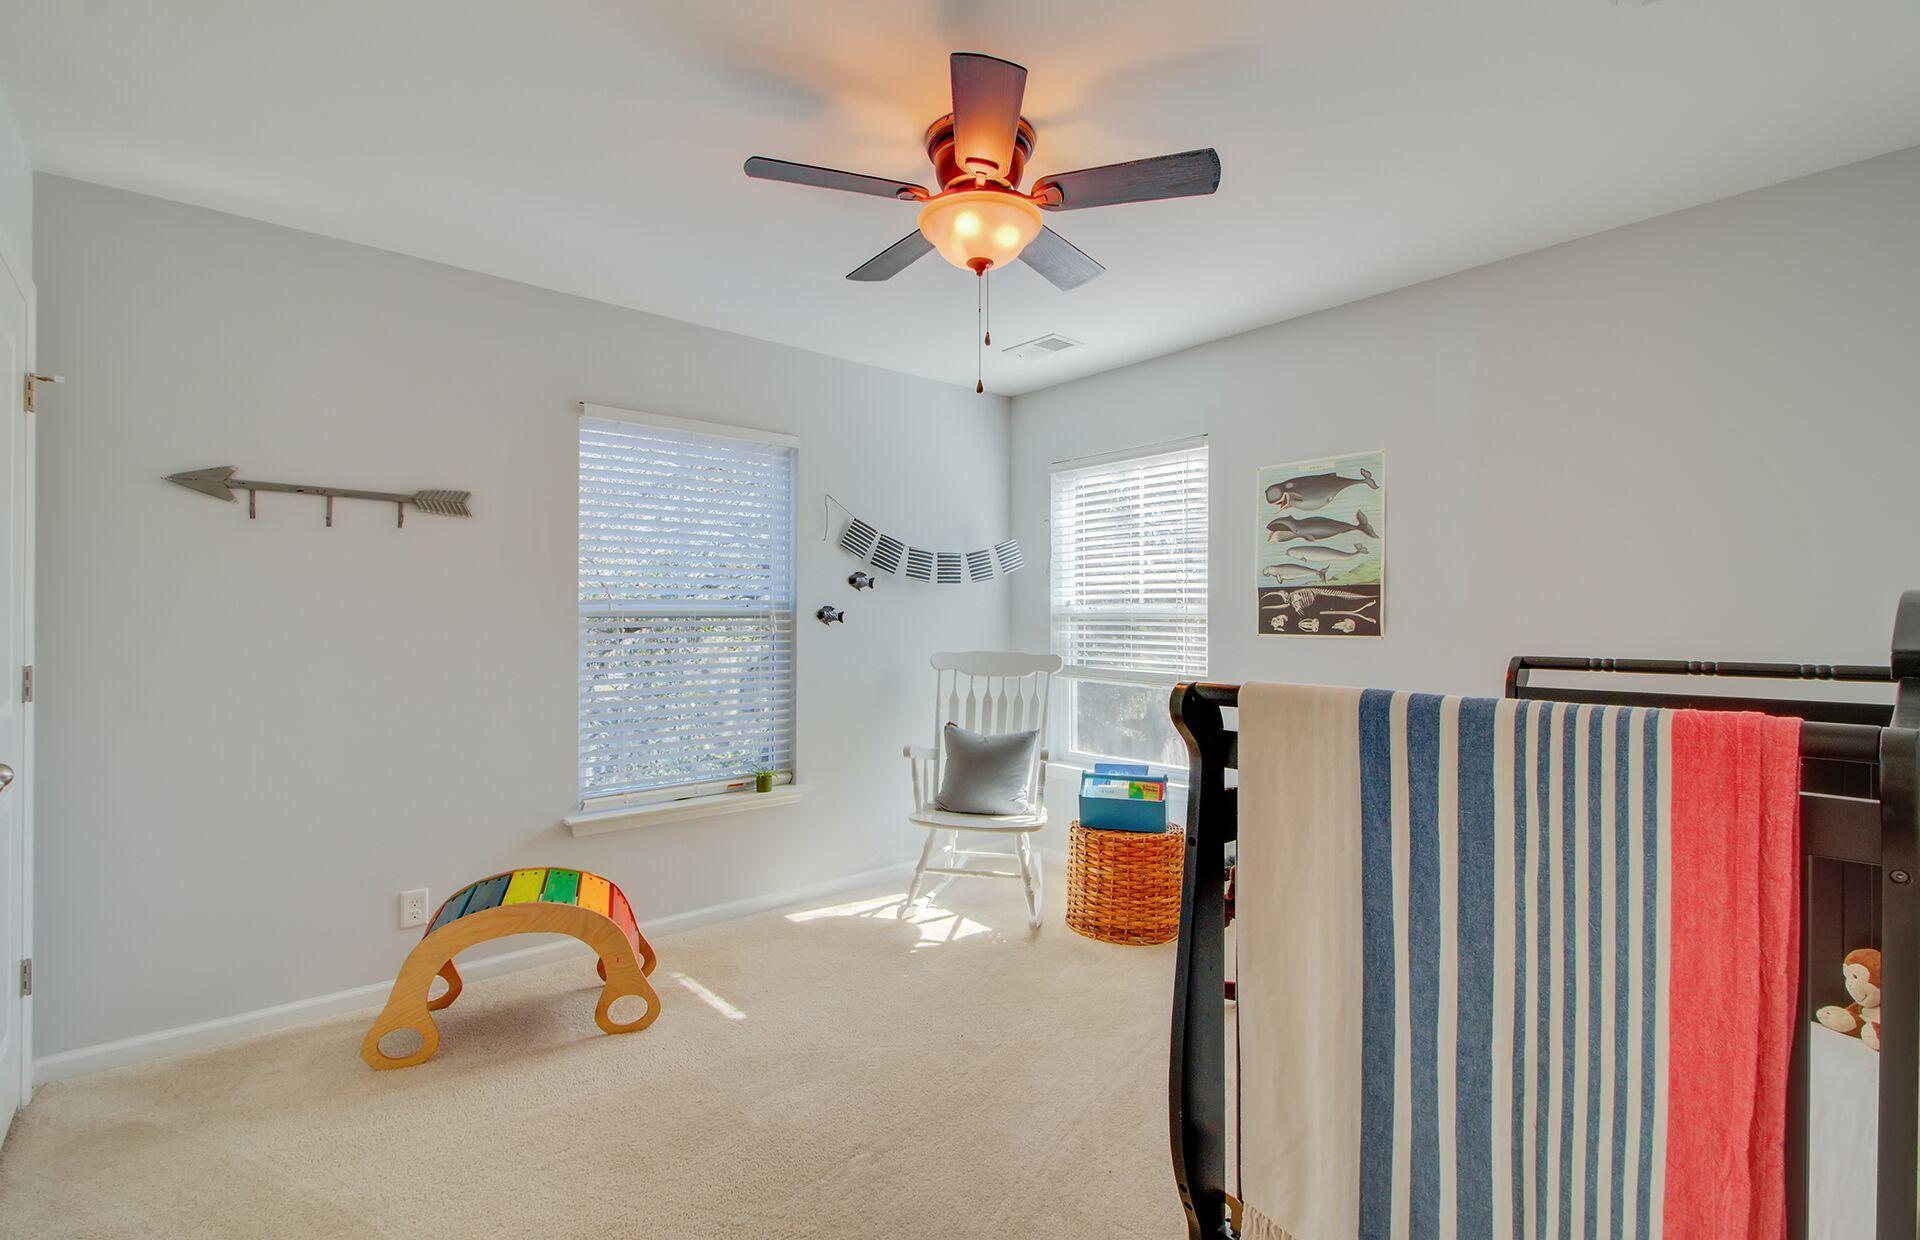 Oak Terrace Preserve Homes For Sale - 4967 Liberty Park, North Charleston, SC - 24